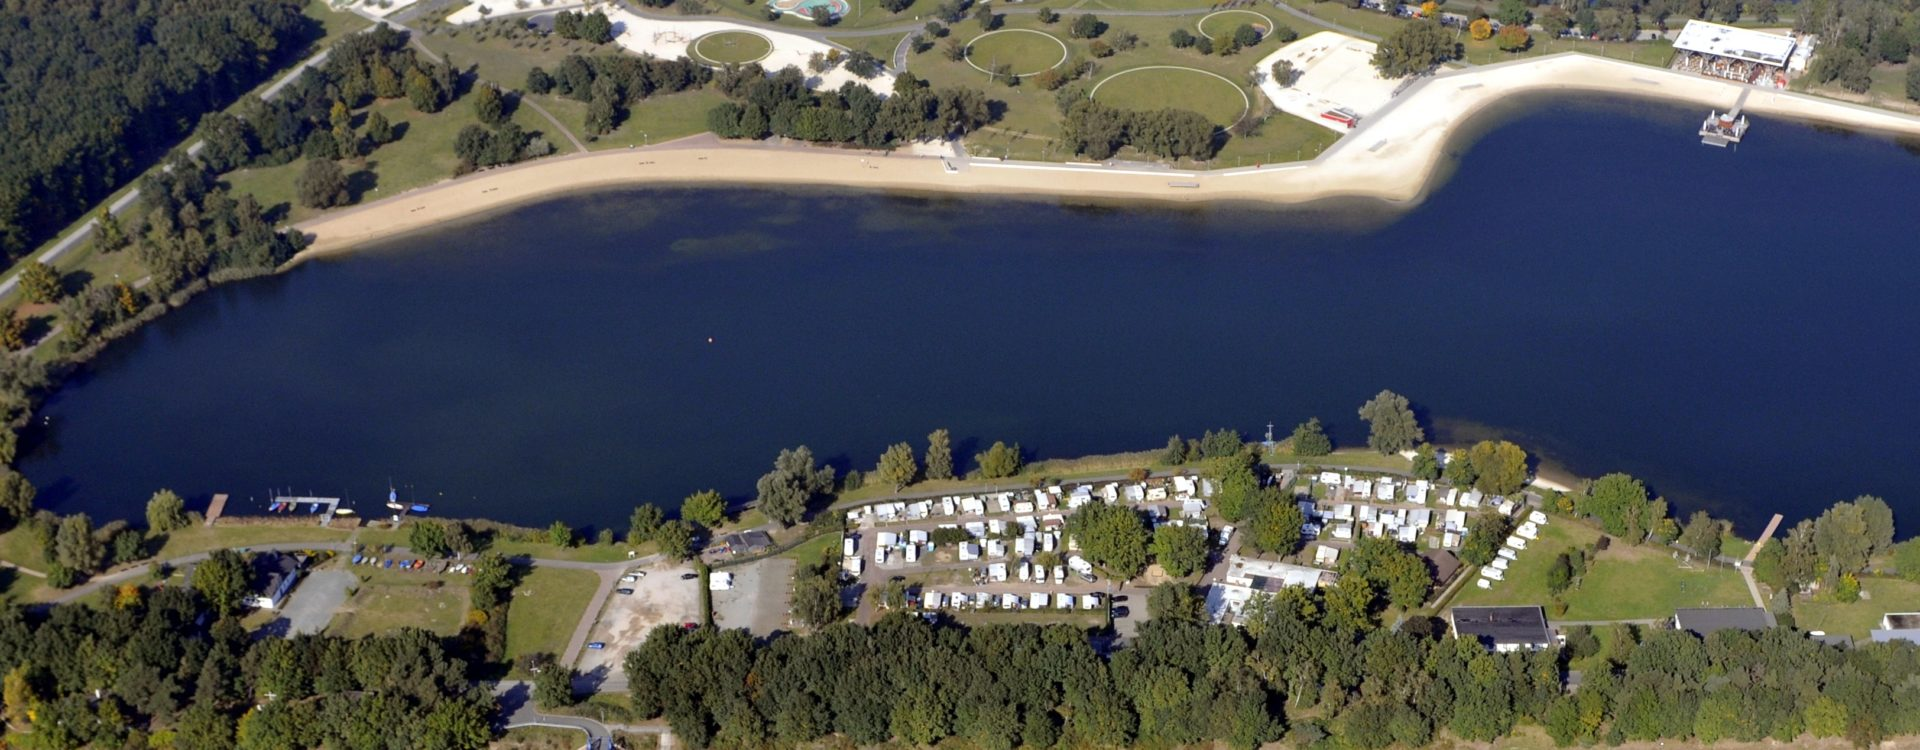 Campingplatz am Allersee